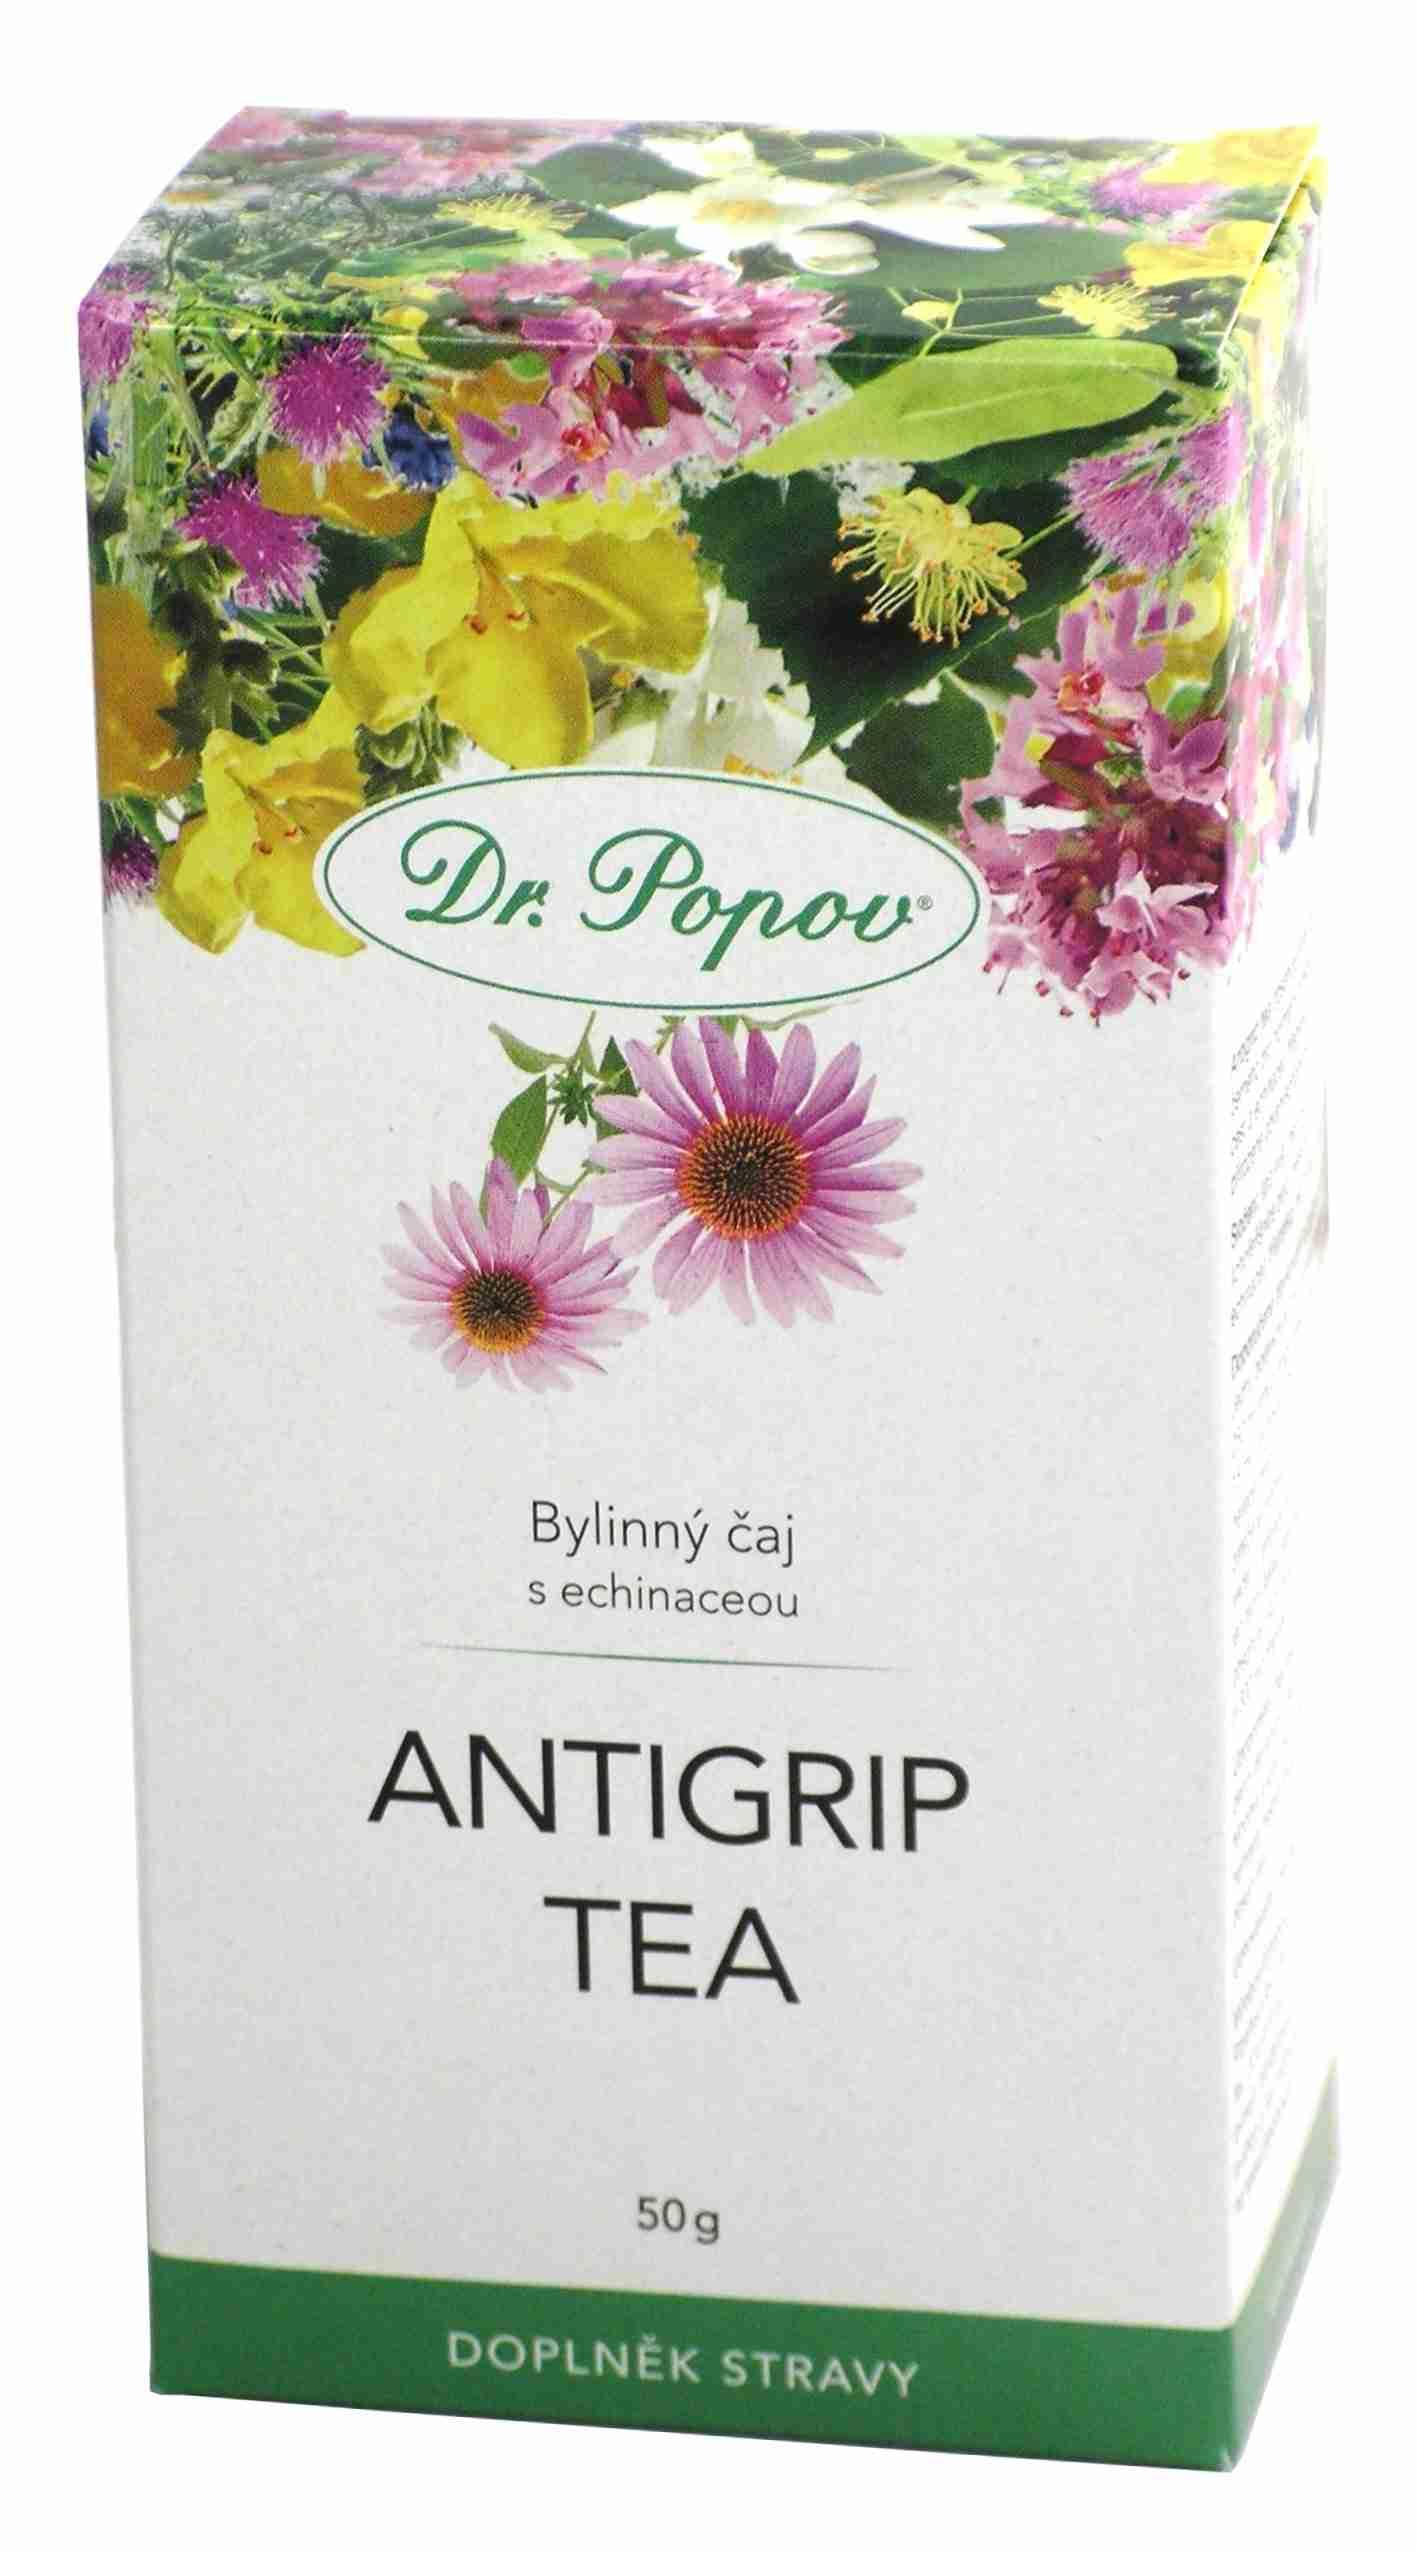 Dr. Popov Antigrip tea sypaný 50 g